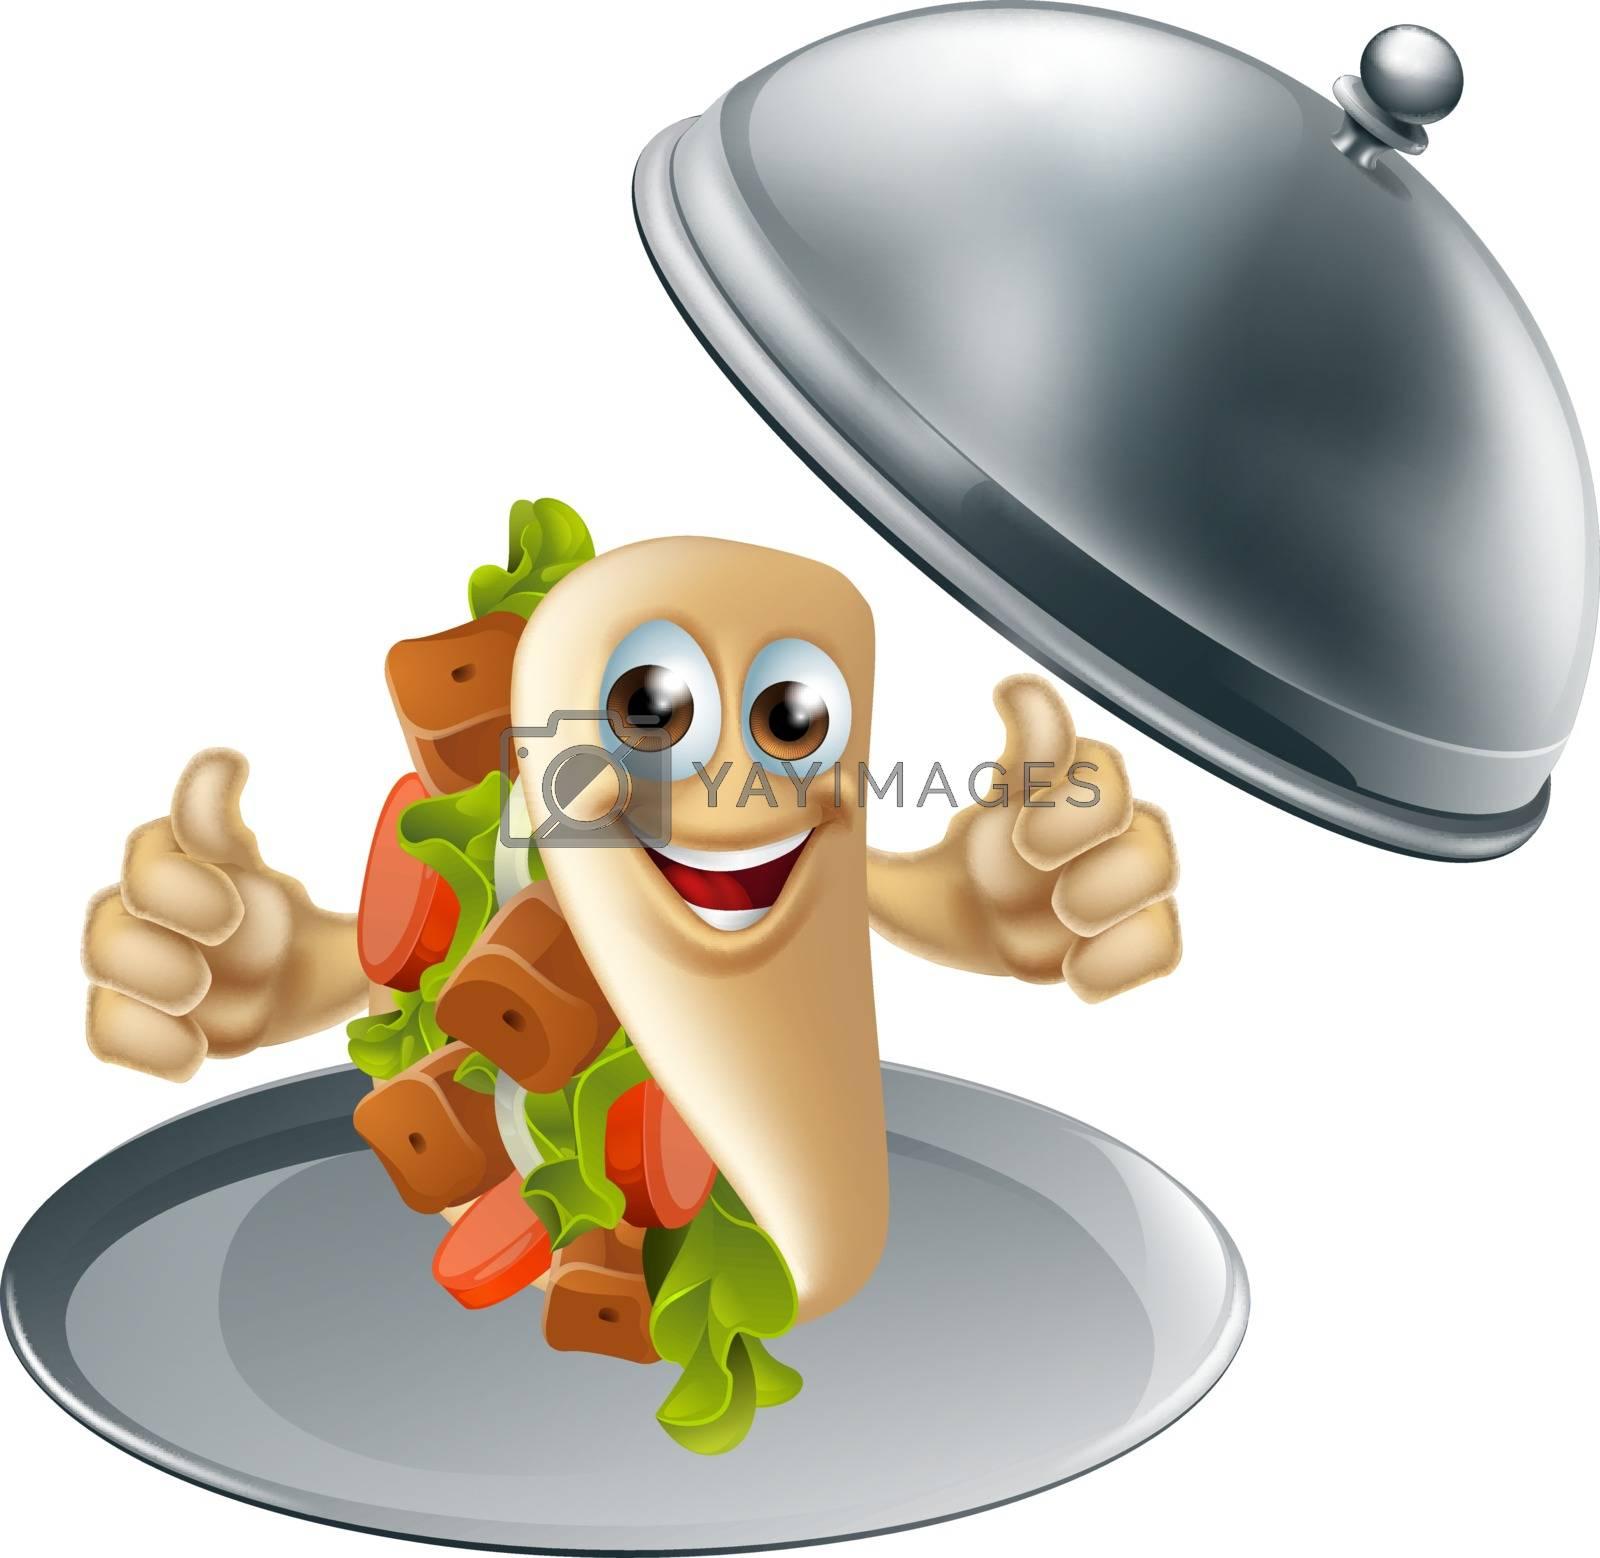 Kebab pita character on serving dish giving a thumbs up